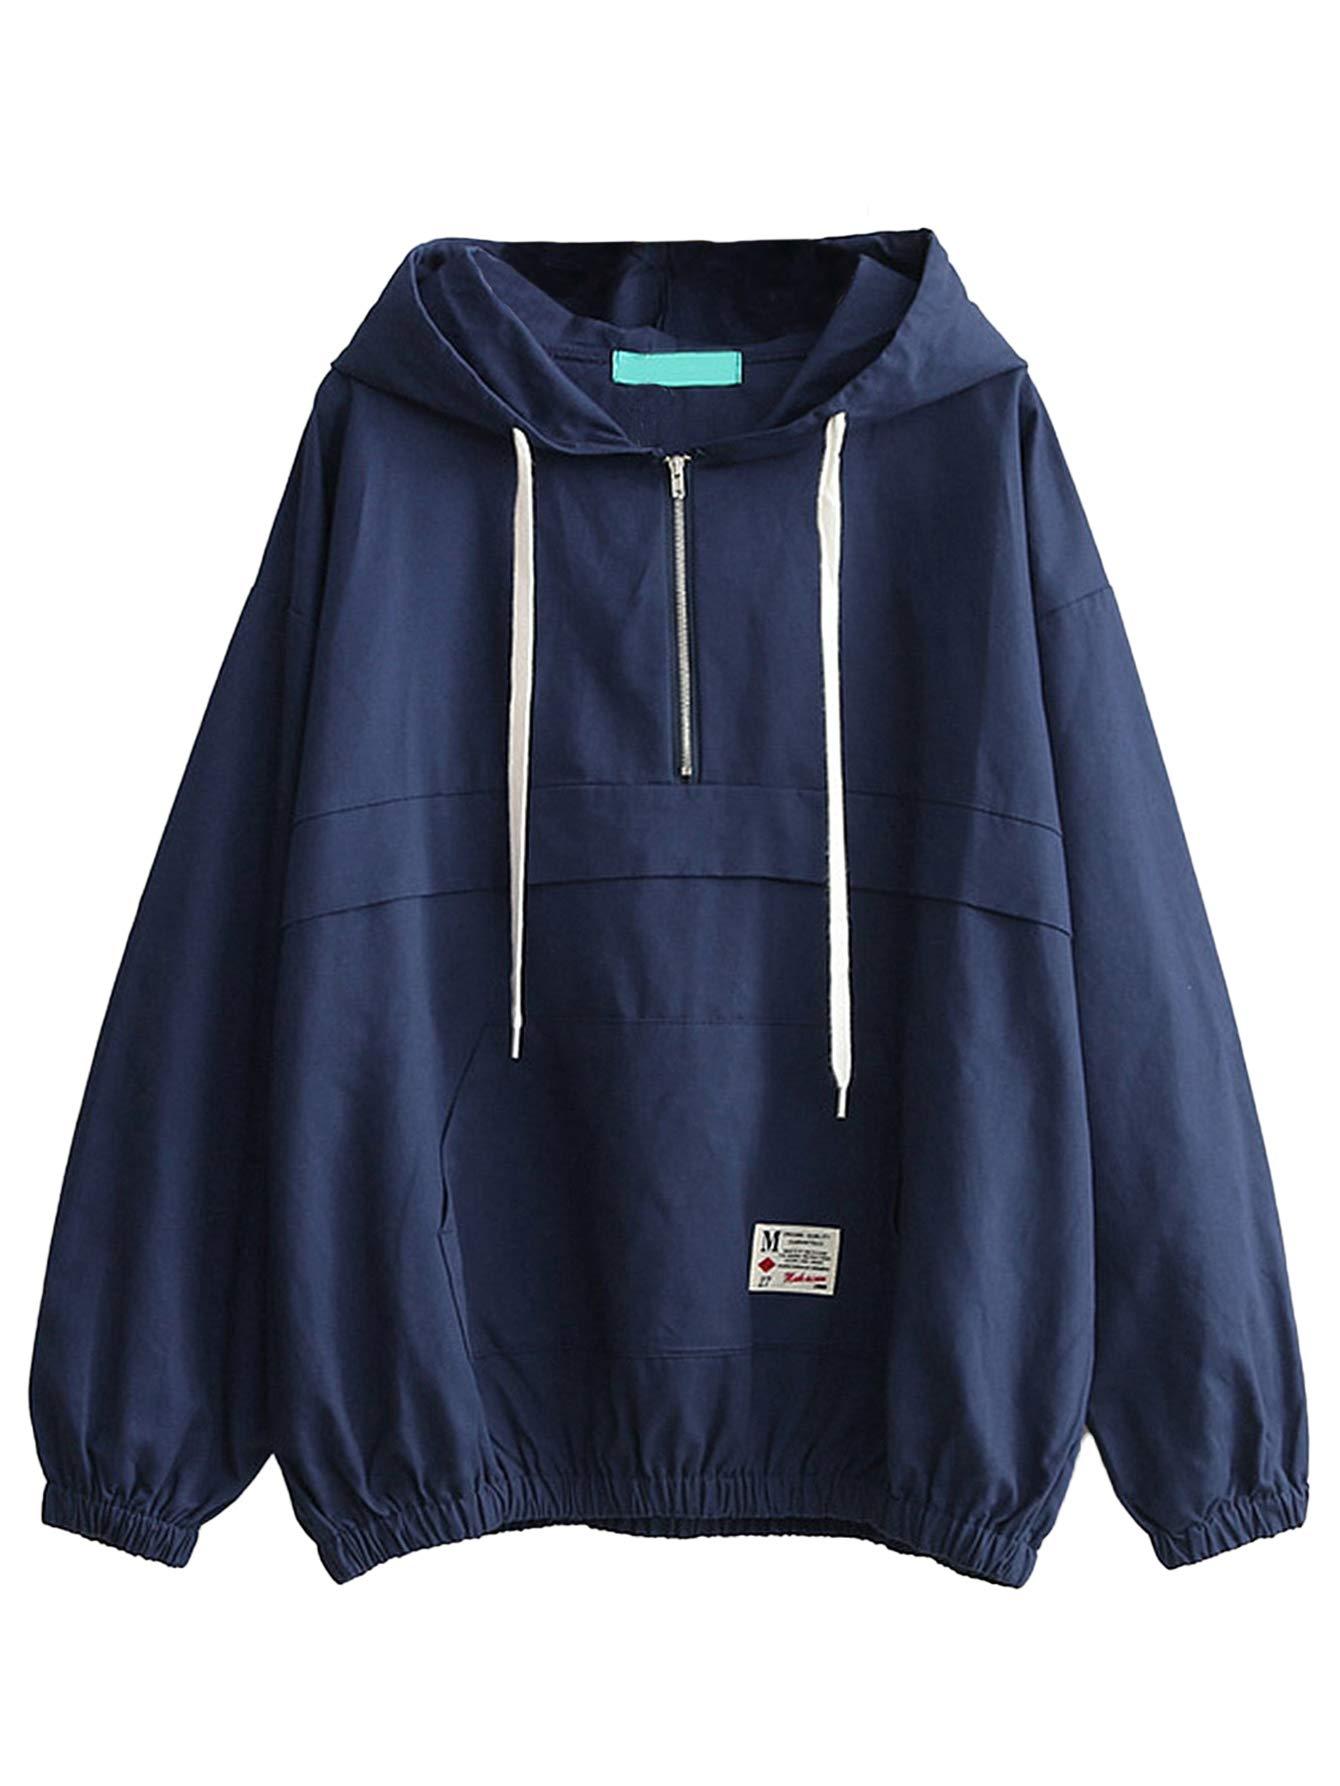 Romwe Women's Lightweight Kangaroo Pocket Anorak Sports Jacket Drawstring Hooded Zip up Windproof Windbreaker Navy XL